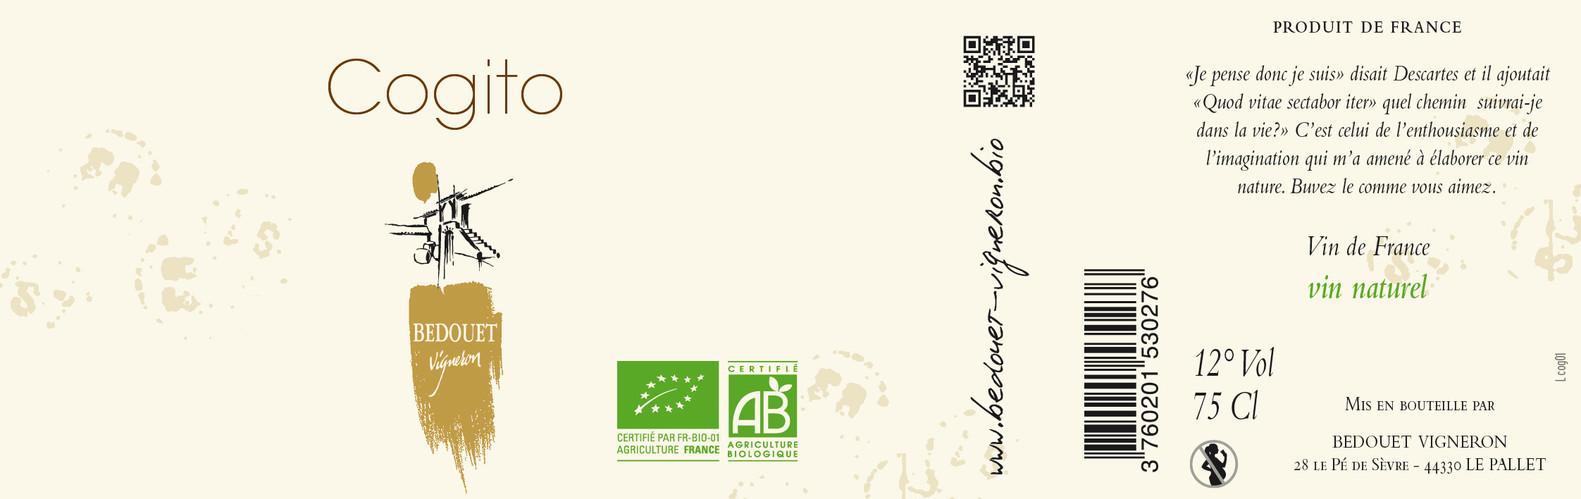 Cogito Bedouet vigneron BIO